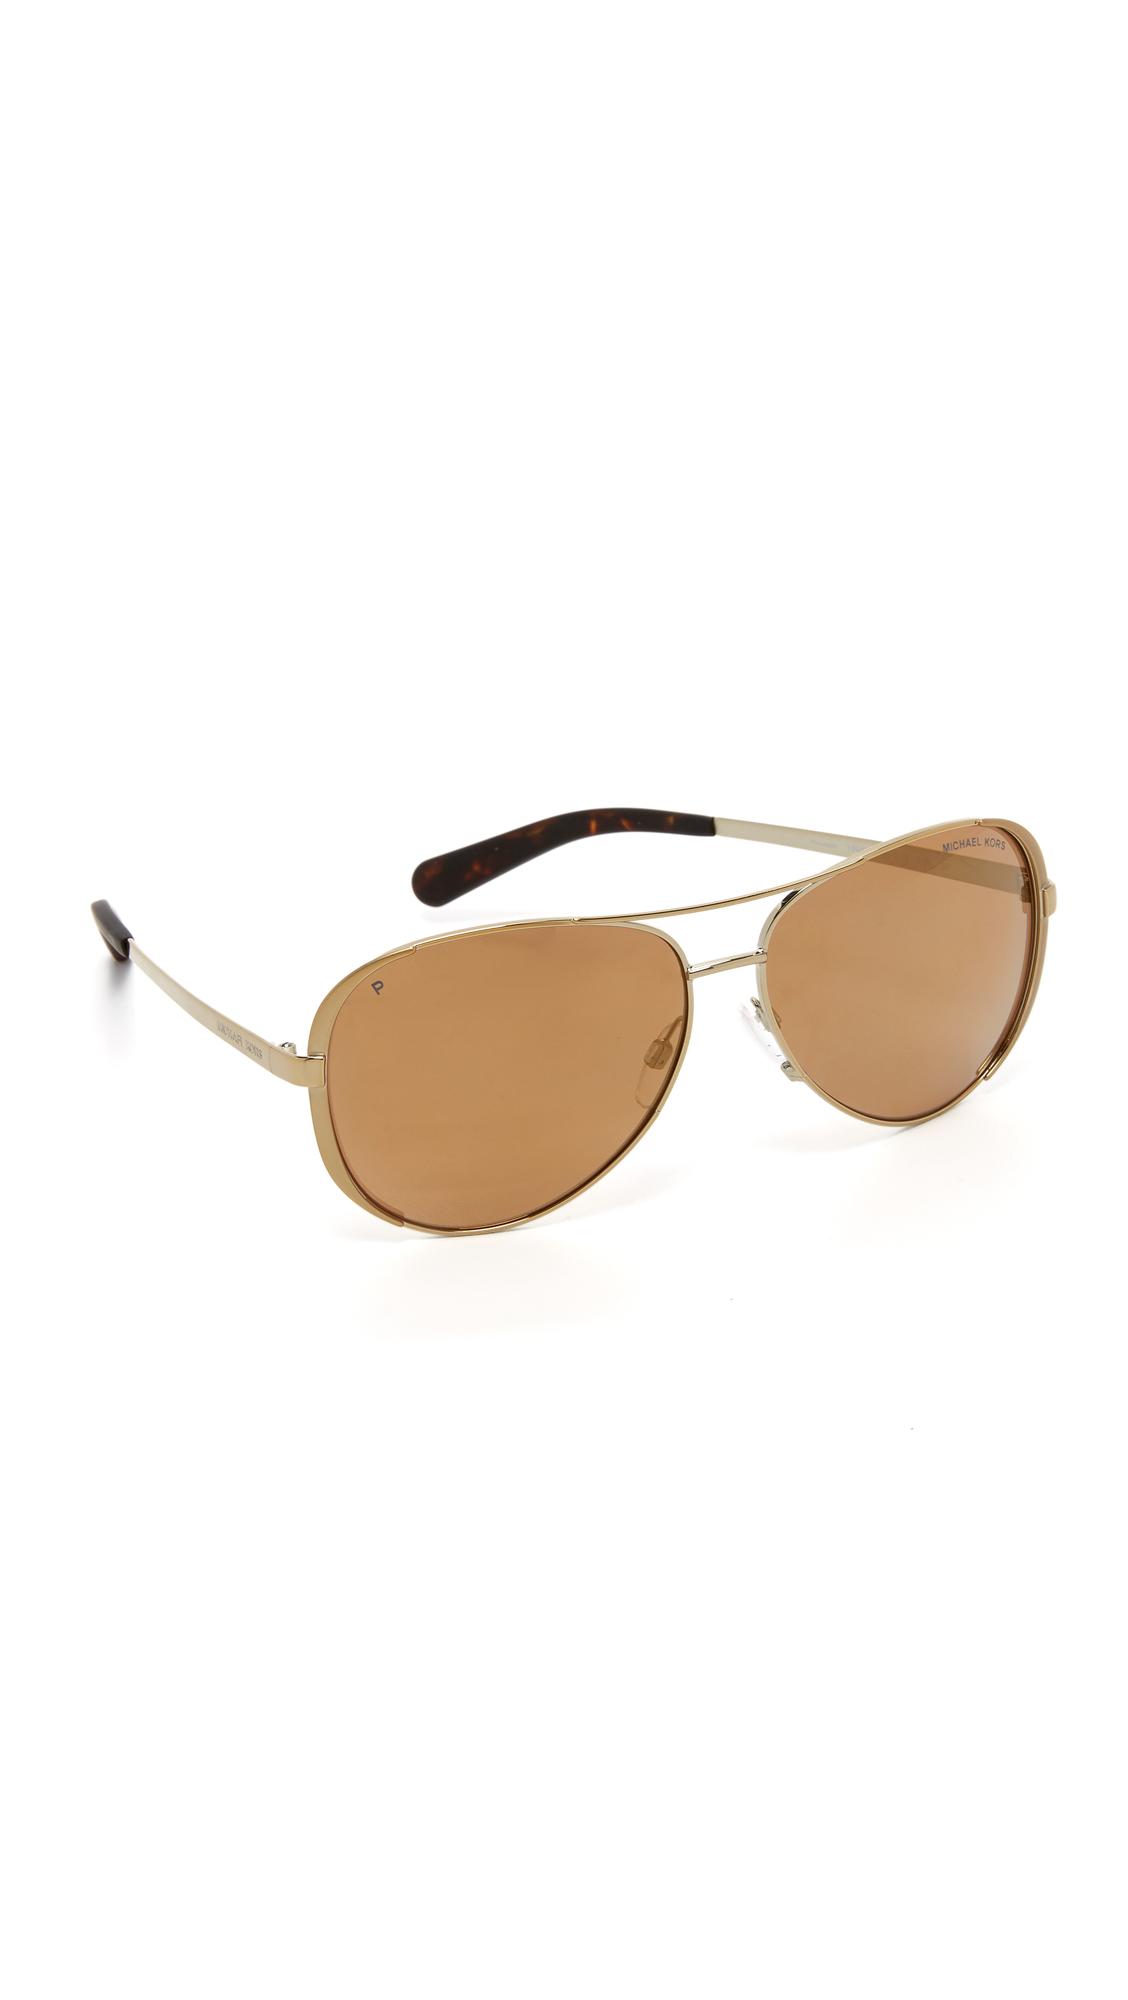 7a08893efa80 Michael Kors Chelsea Polarized Sunglasses - Gold/gold in Metallic - Lyst